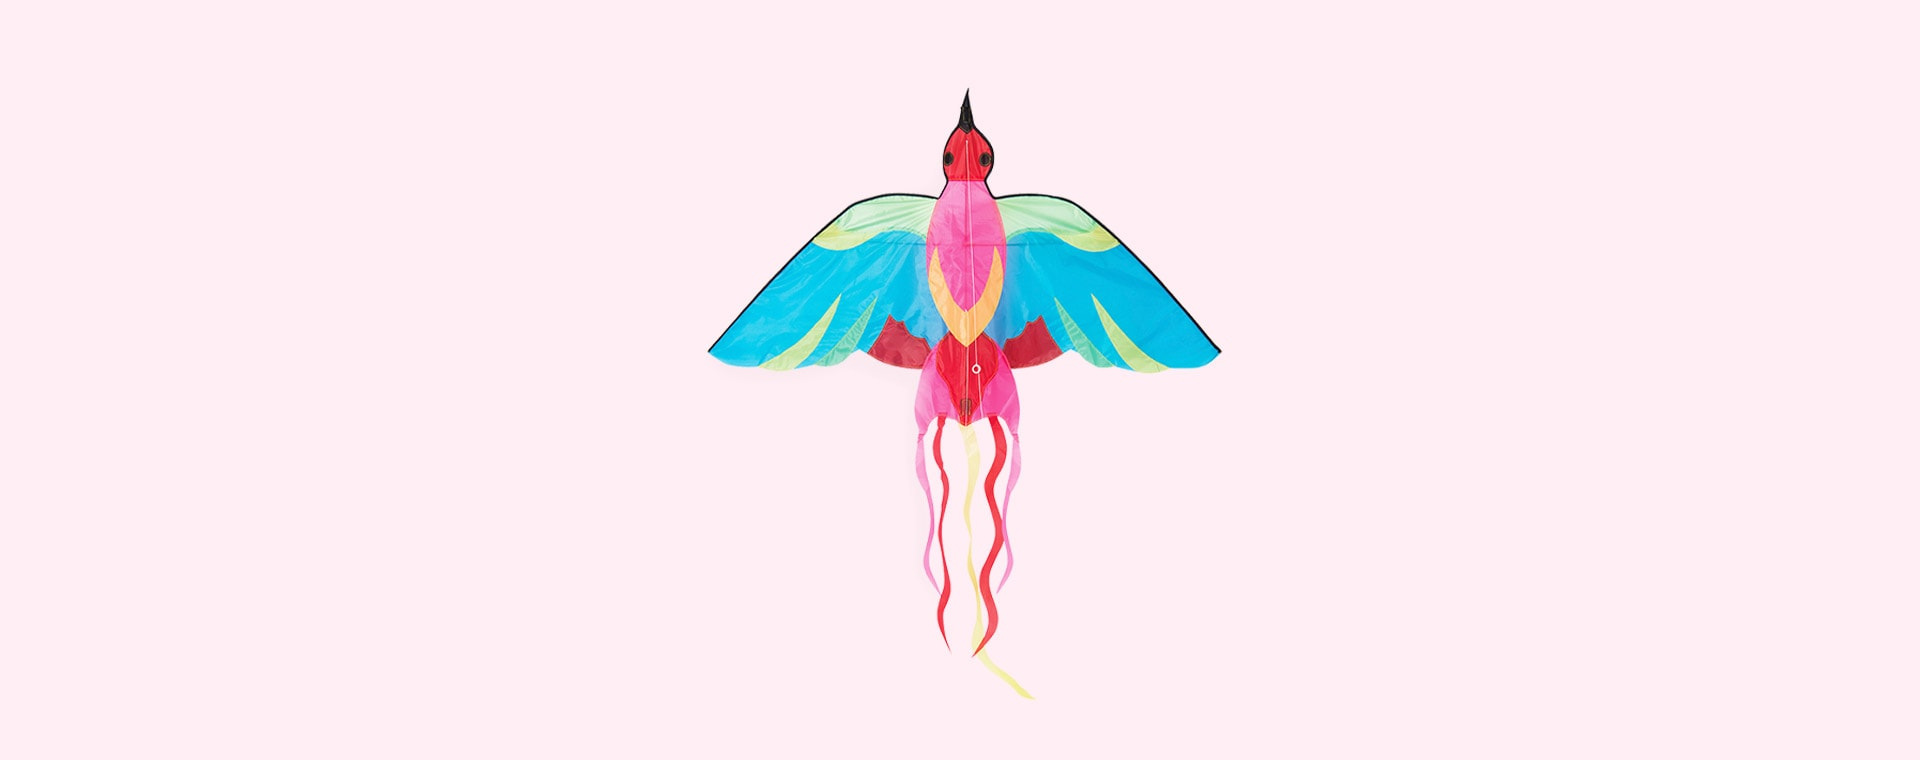 Multi Moulin Roty Bird Kite